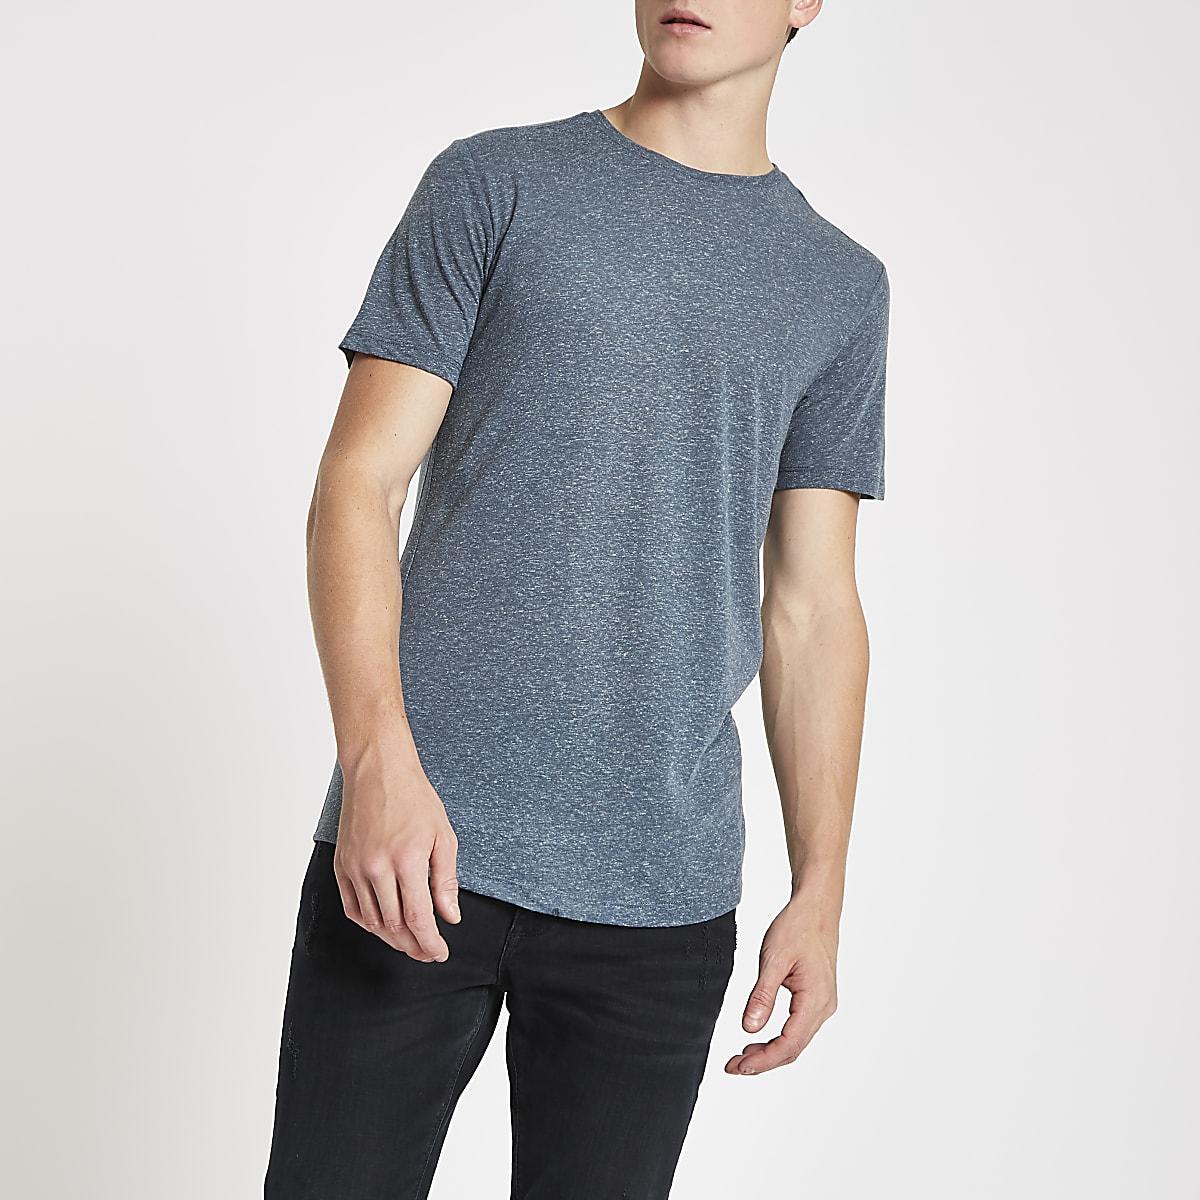 Jack & Jones navy blue Premium T-shirt